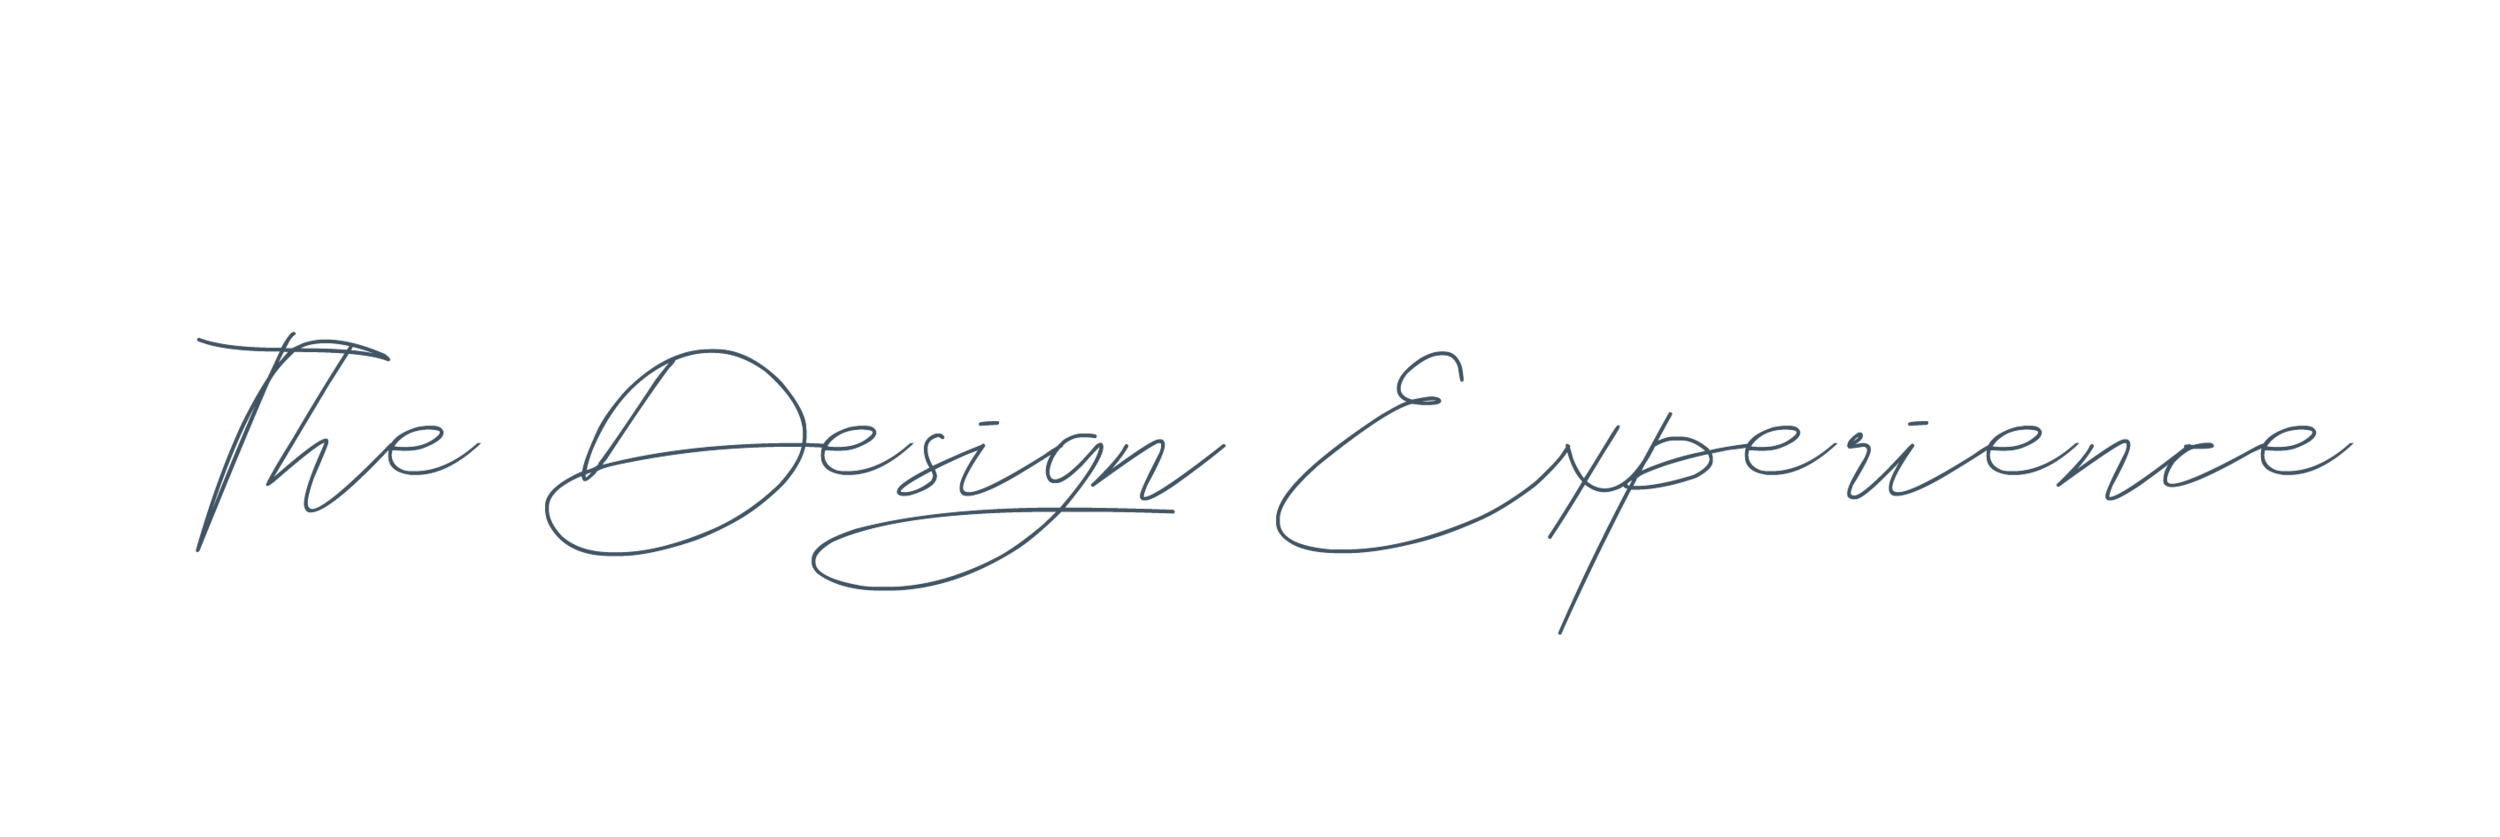 title design-02.png